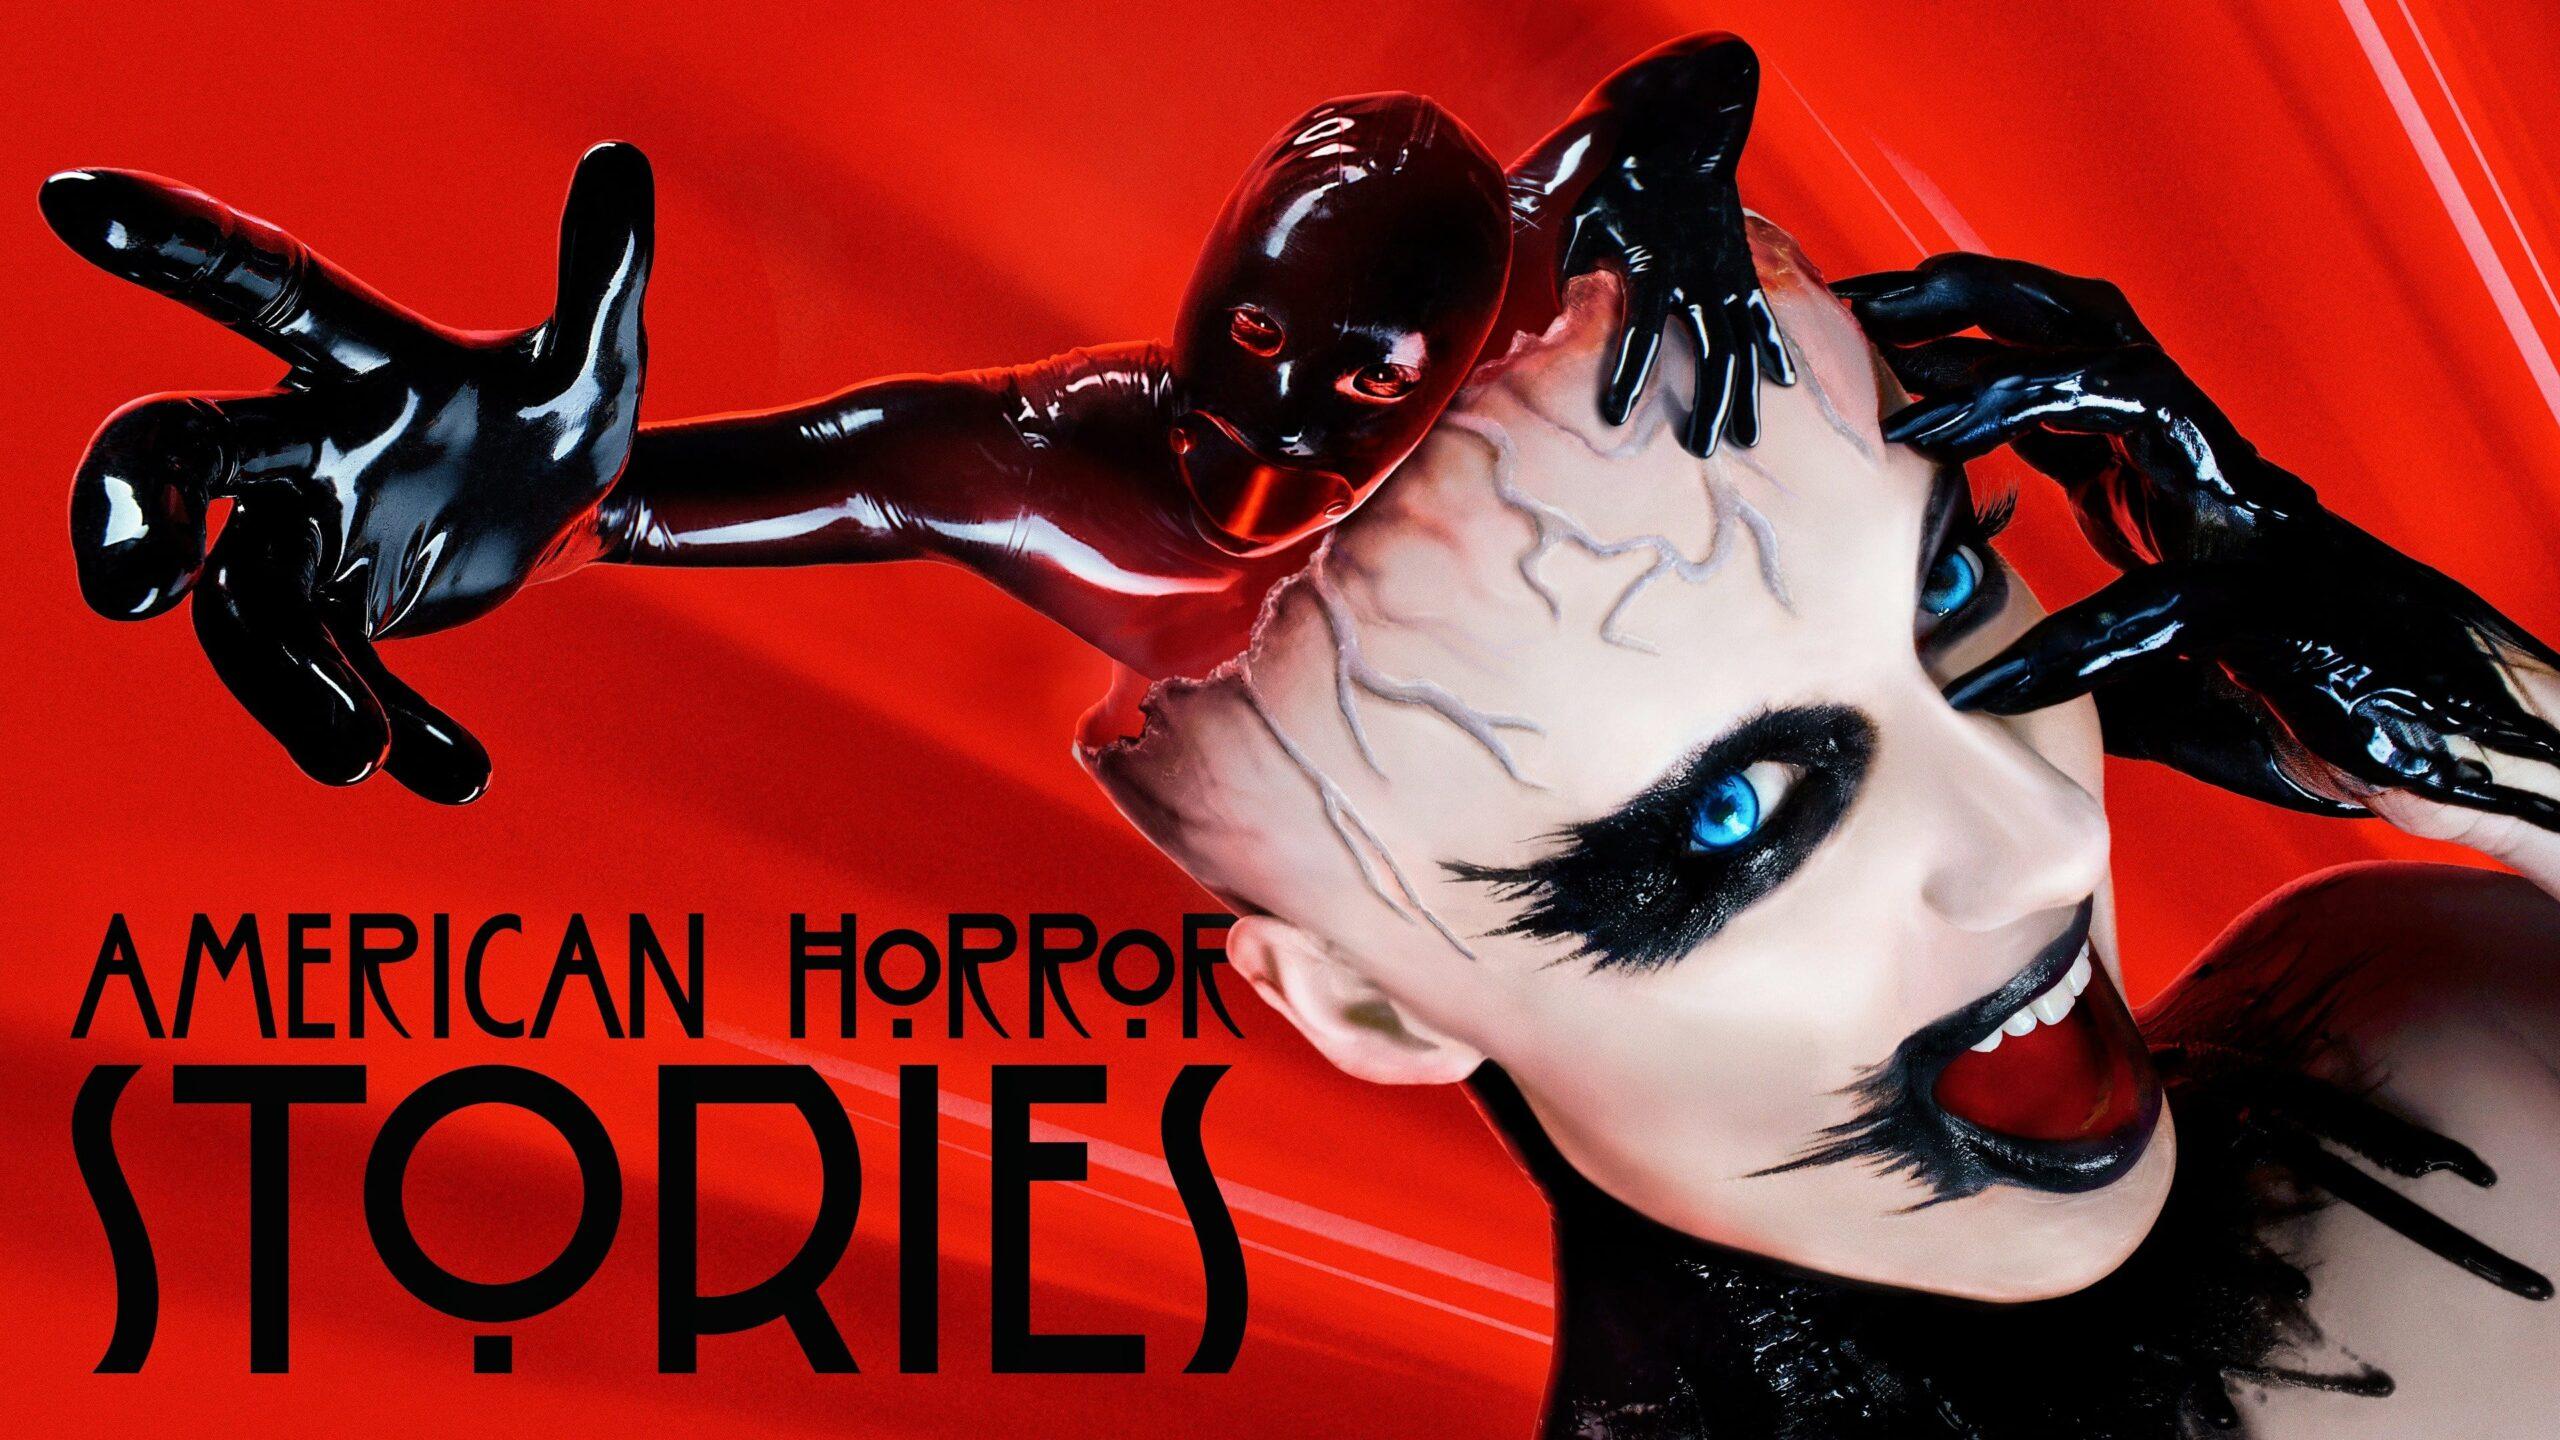 American Horror Stories Season 1 Episode 4